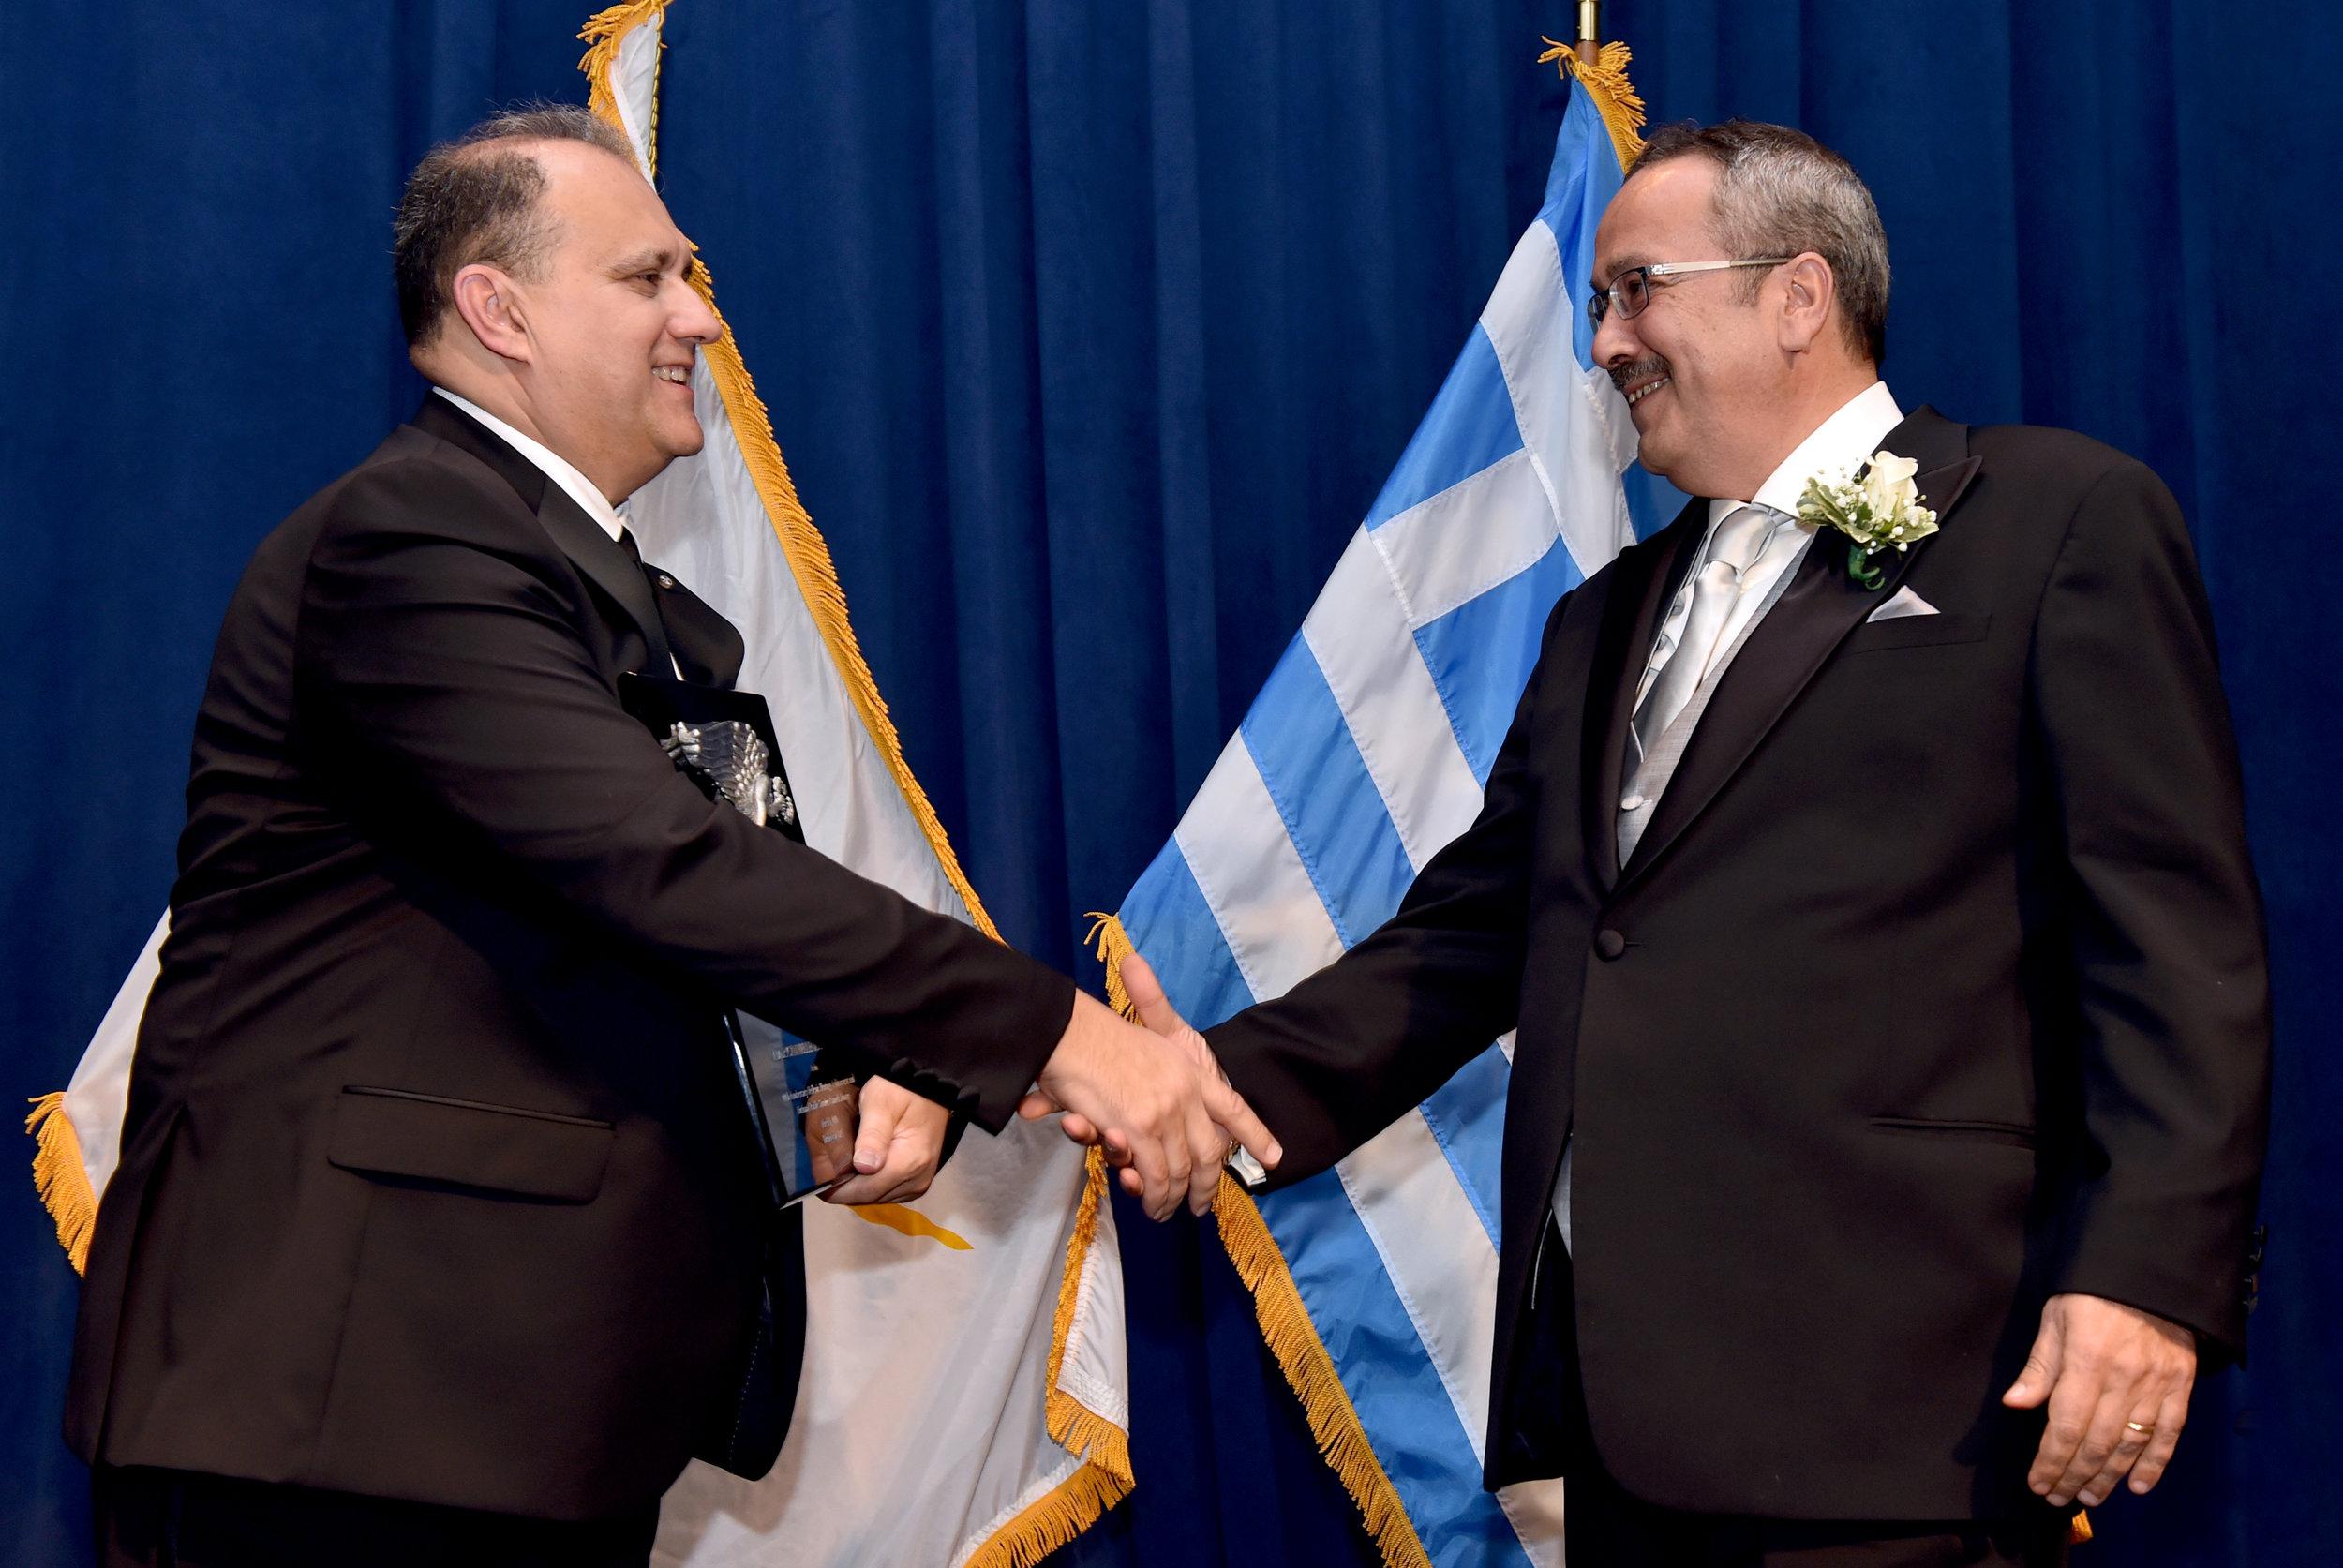 Dr. Spiro Spireas and AHI President Nick Larigakis